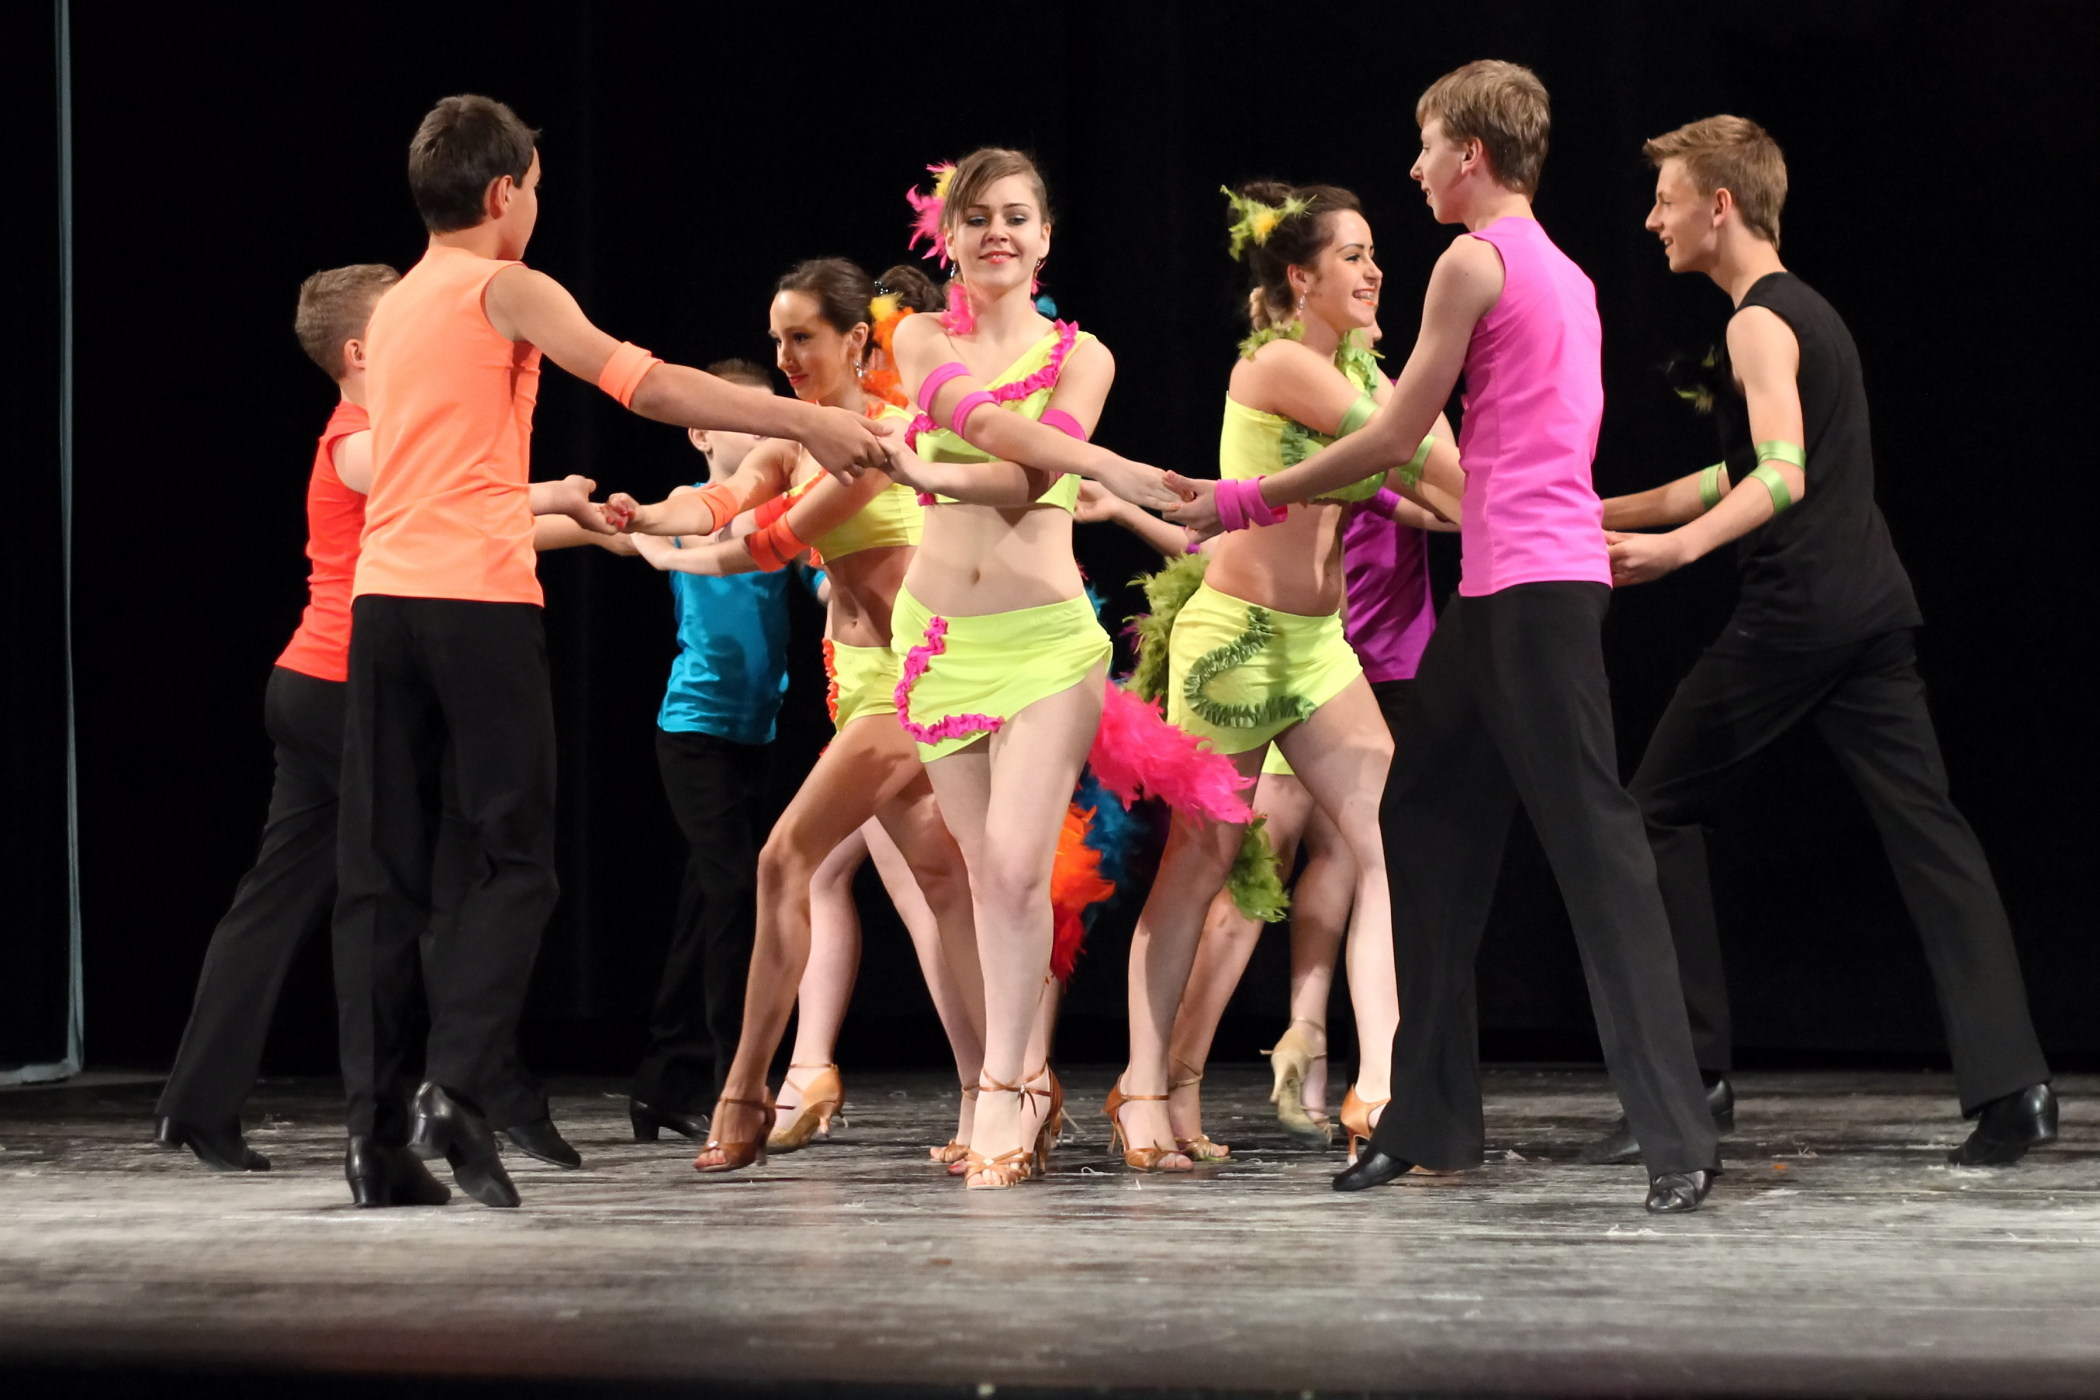 zvolenske-tanecne-podium-6